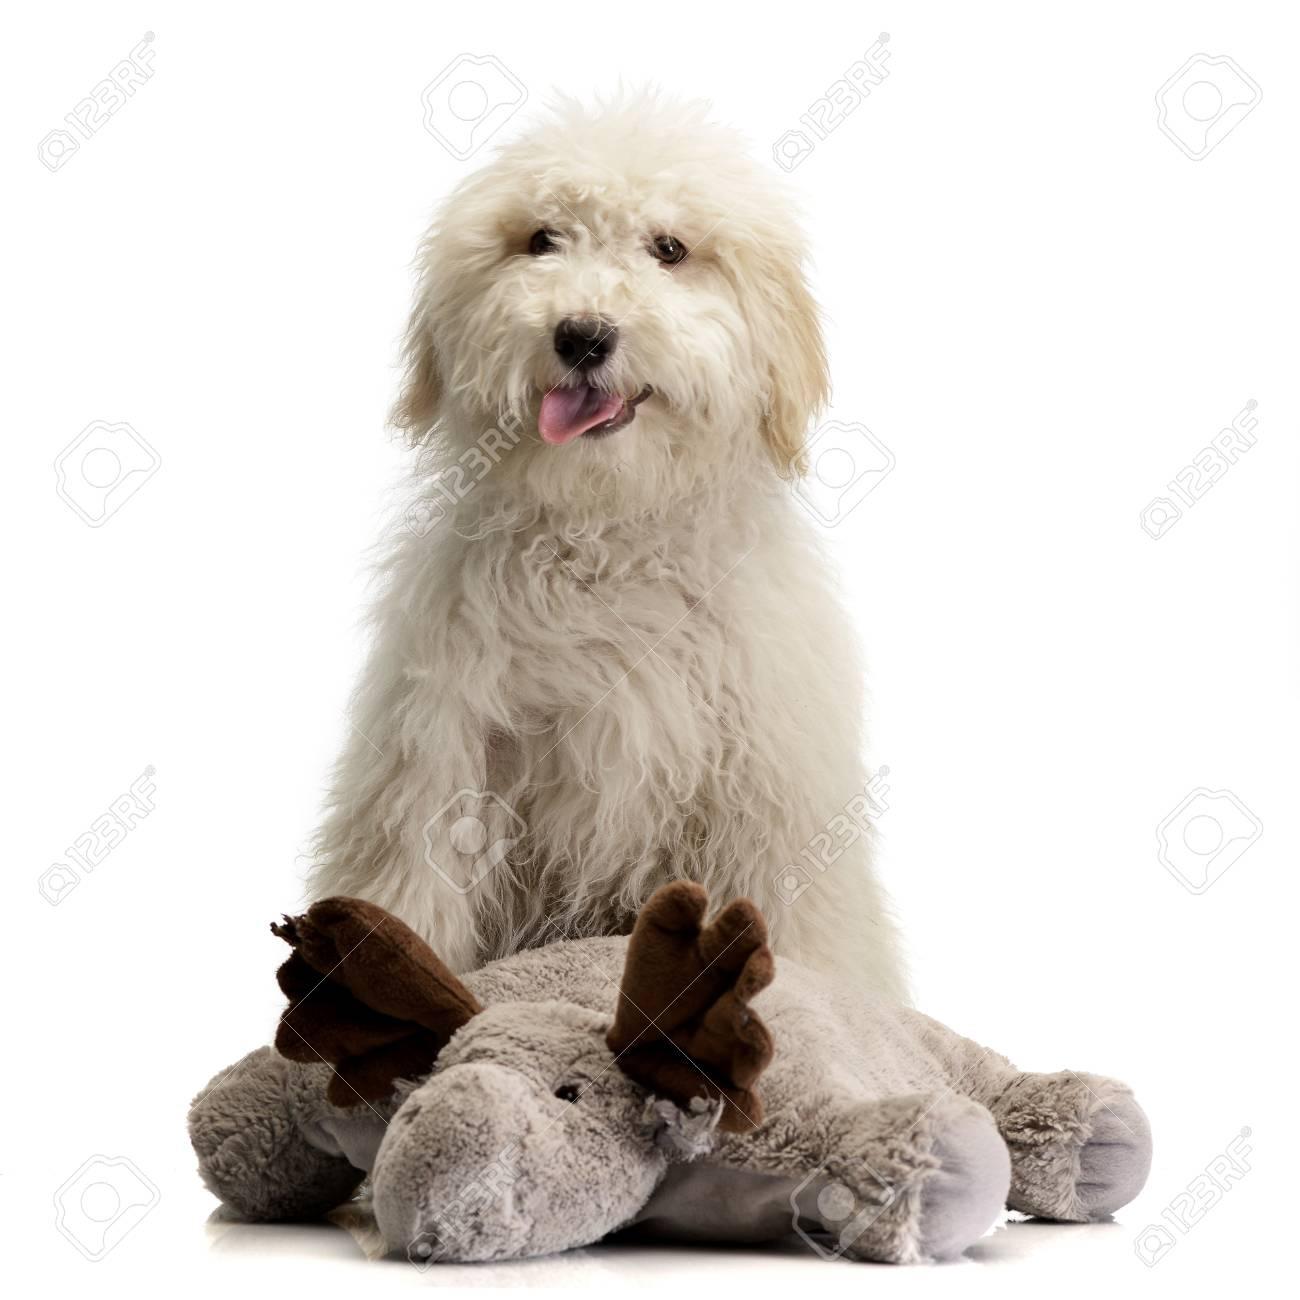 Studio Shot Of A Cute Tibetan Terrier Puppy With Reindeer Plush